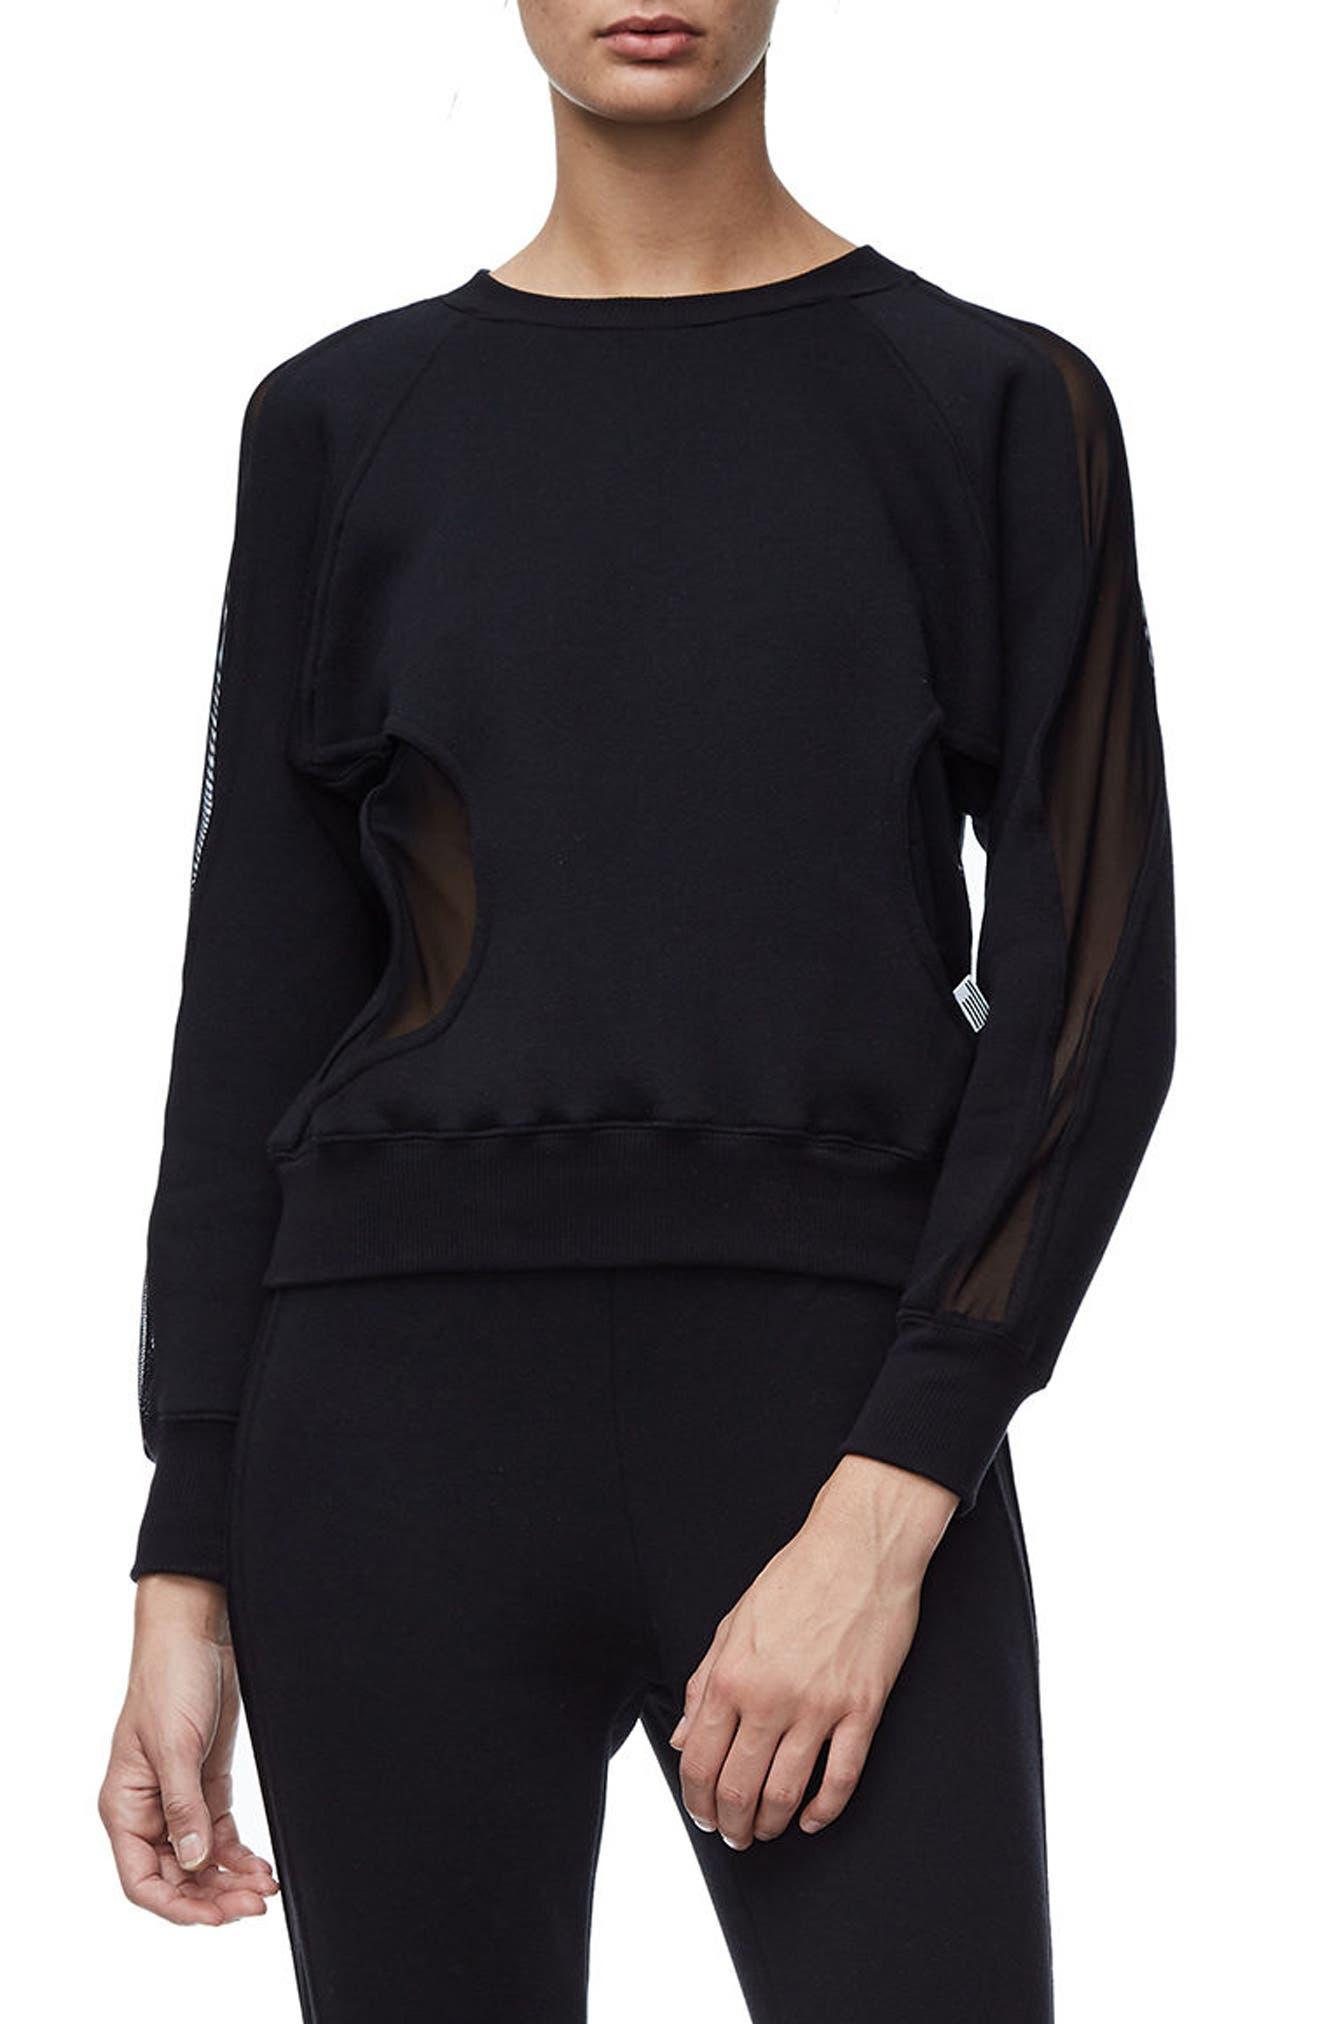 Good Sweats Mesh Inset Sweatshirt,                         Main,                         color, Good Black